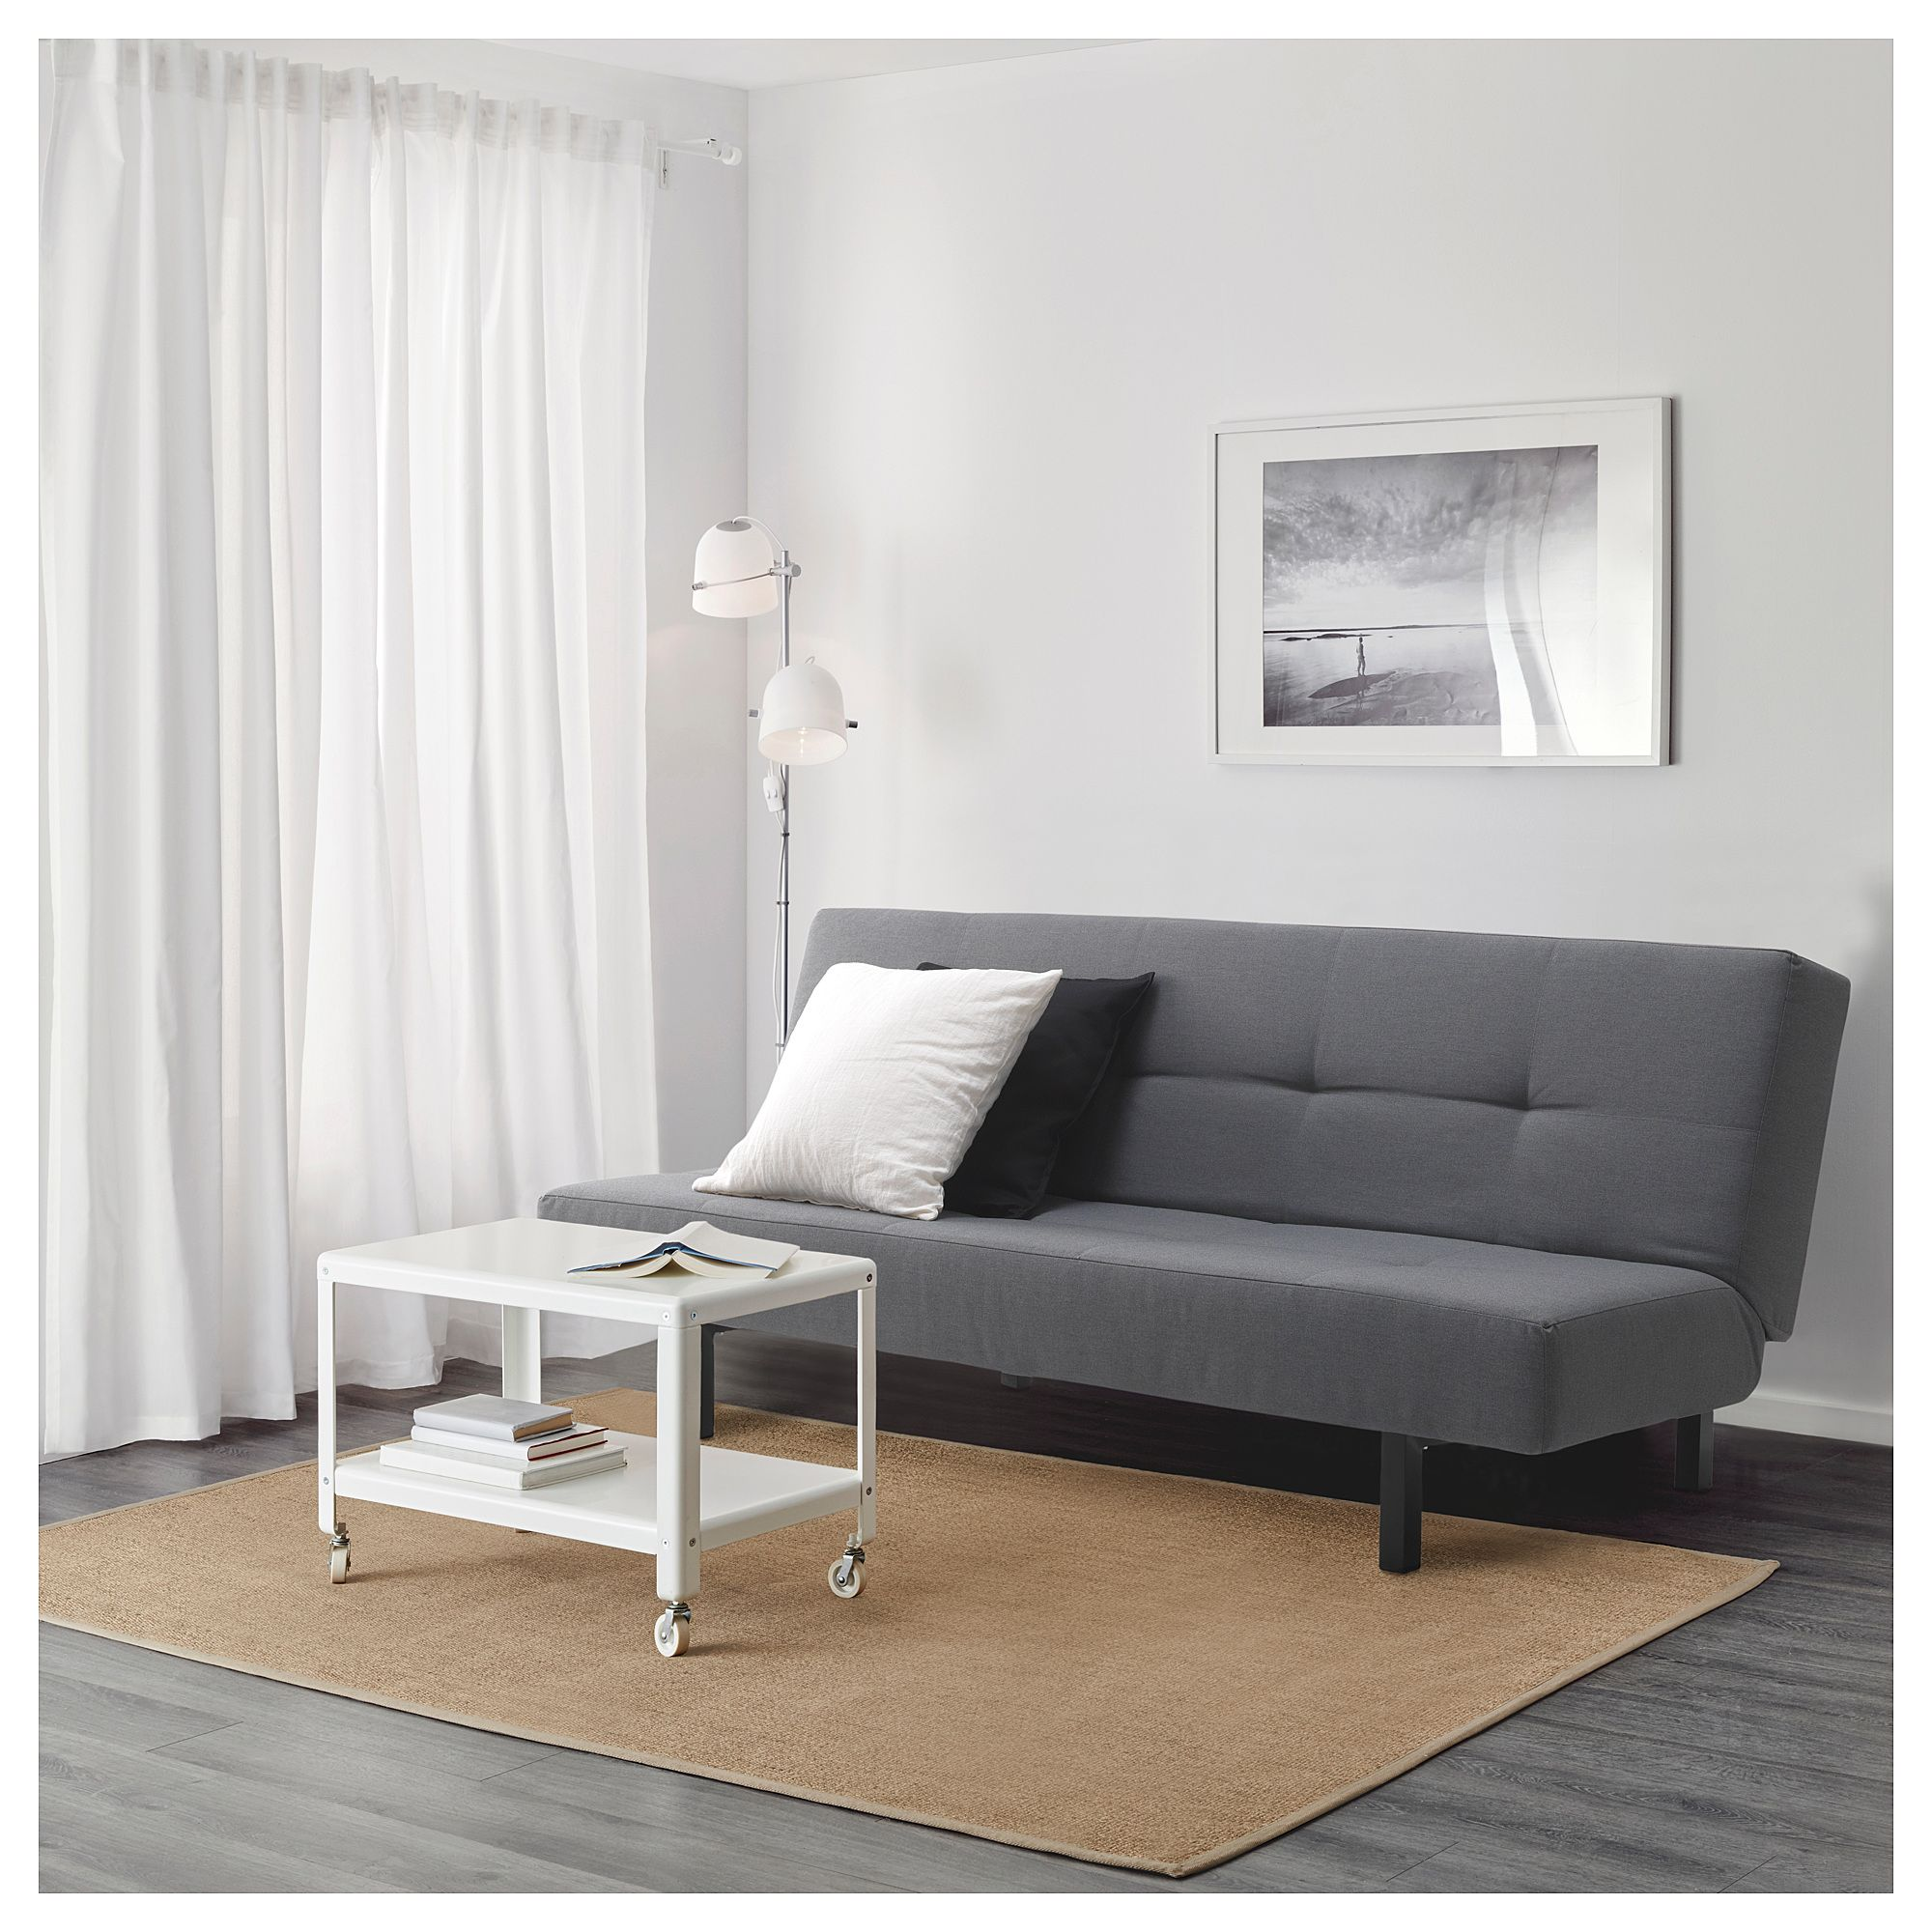 BALKARP Sleeper sofa, Knisa black | Design Ideas   Home Office